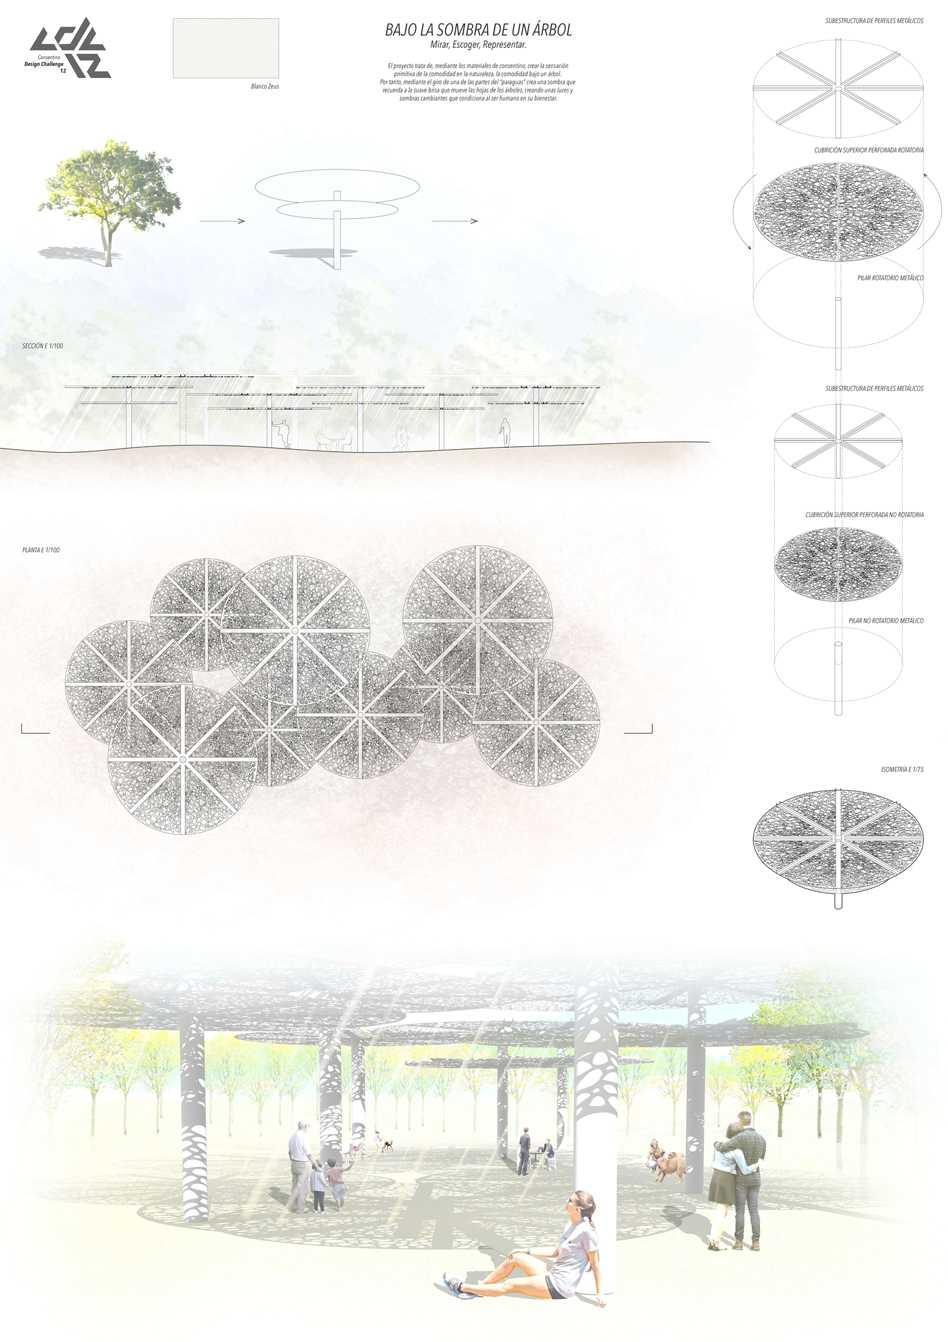 Cosentino Design Challenge12  - 24 05 45